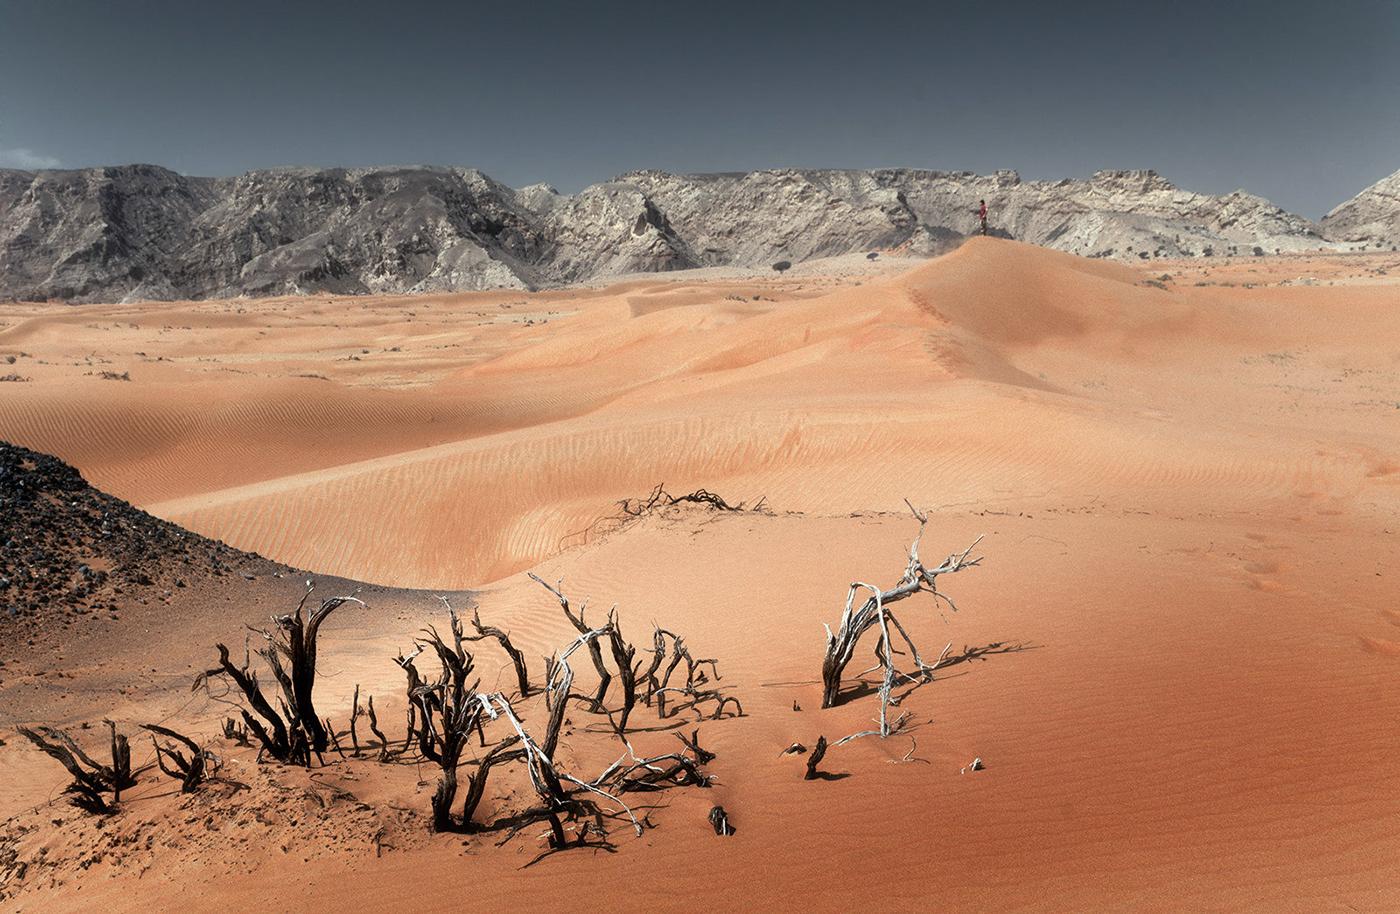 Desert. My Home